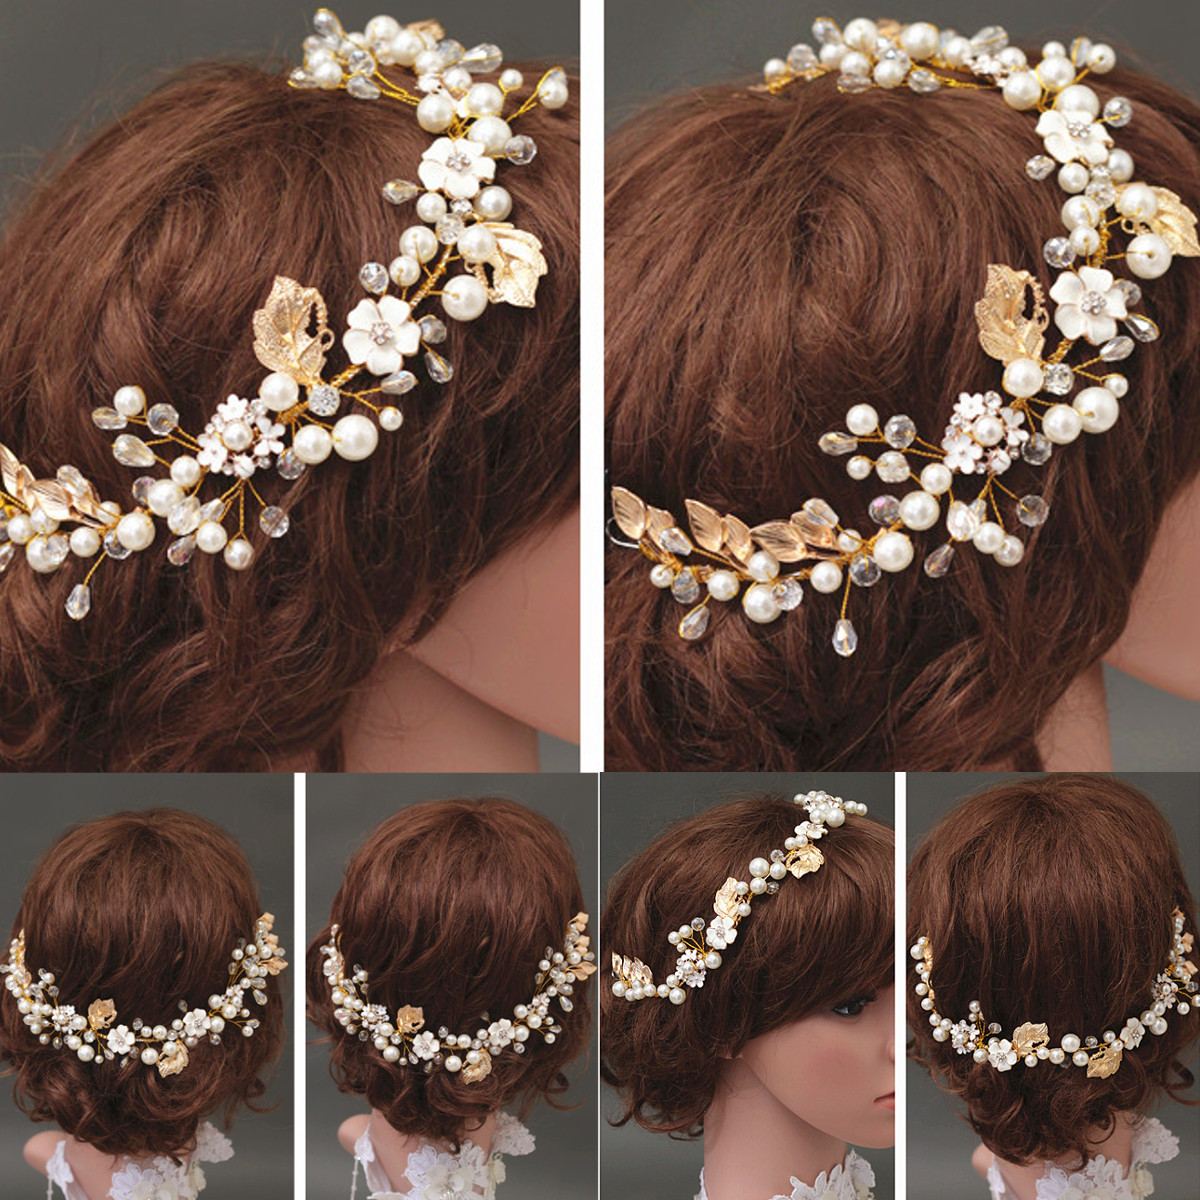 Bride Luxury Crystal Pearl Bead Hair Chain Wedding Bridal Tiara Hair Accessories Headbrand